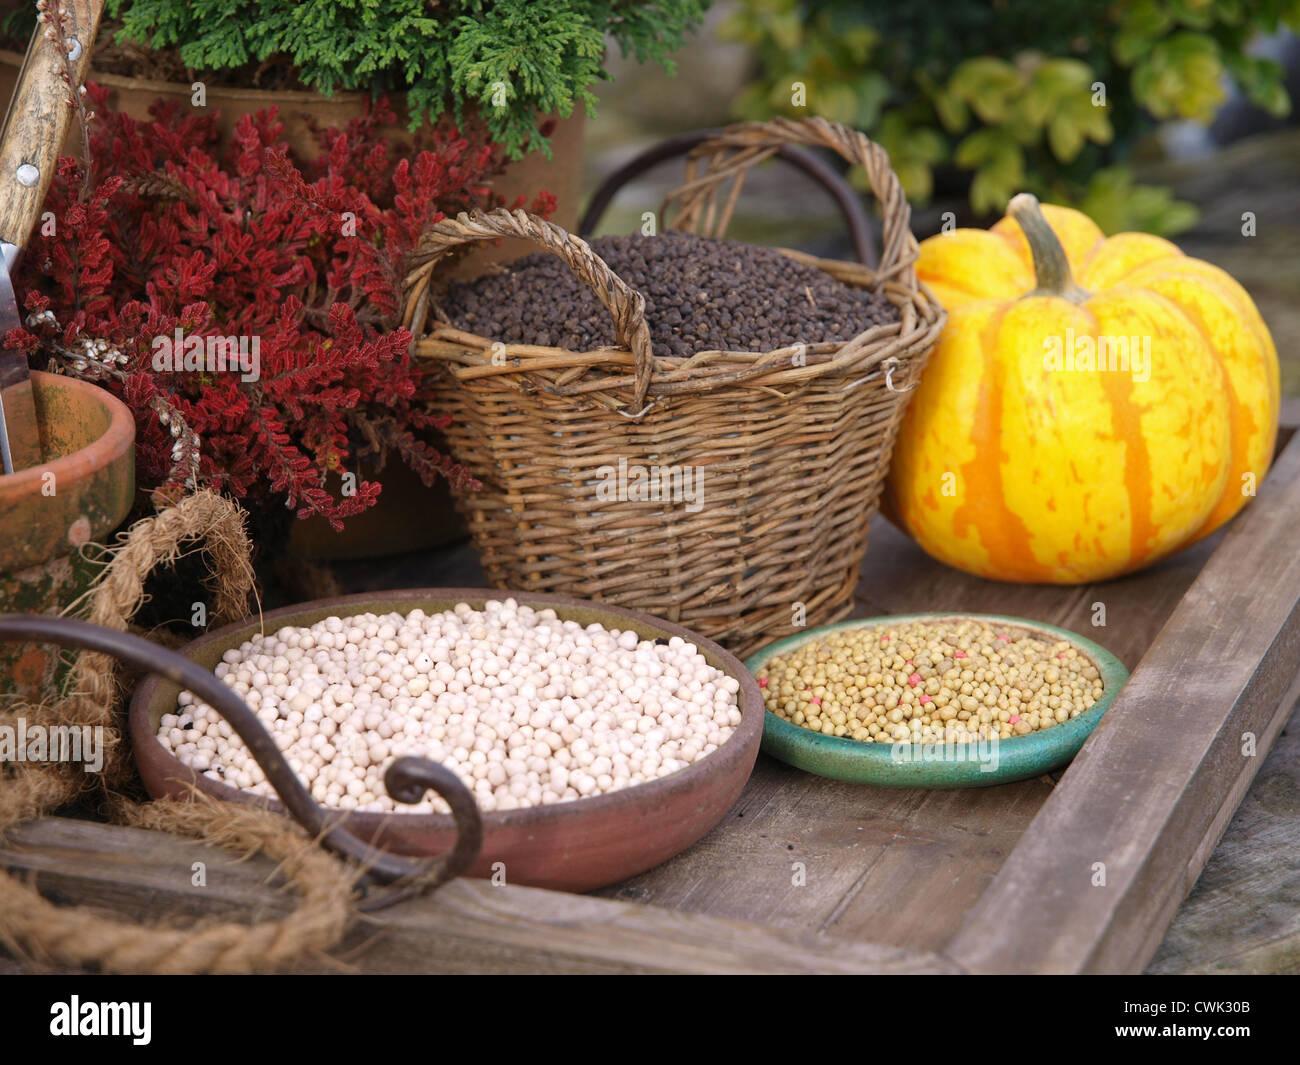 Garden Fertilizer Stock Photo: 50206587 - Alamy